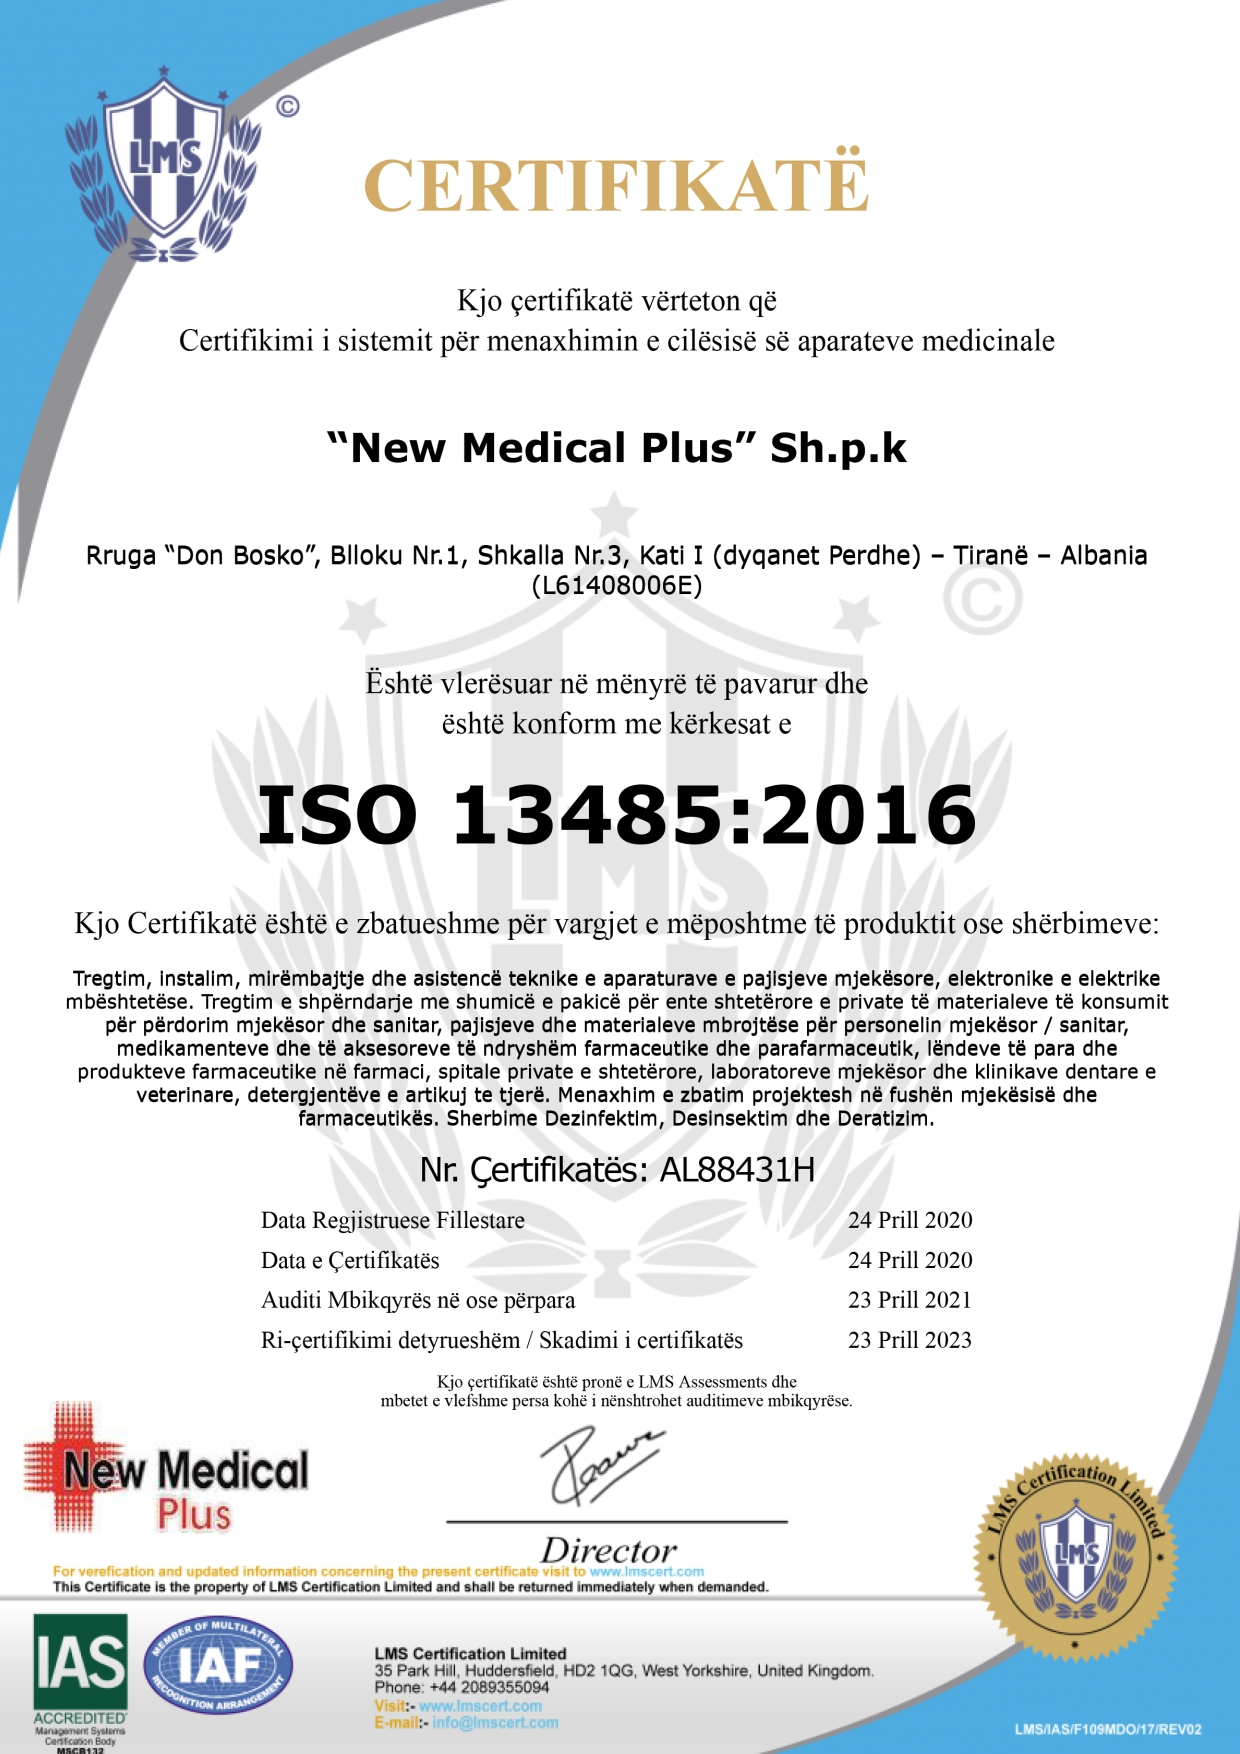 NEW MEDICAL PLUS WEBSITE CERTIFIKATA 6